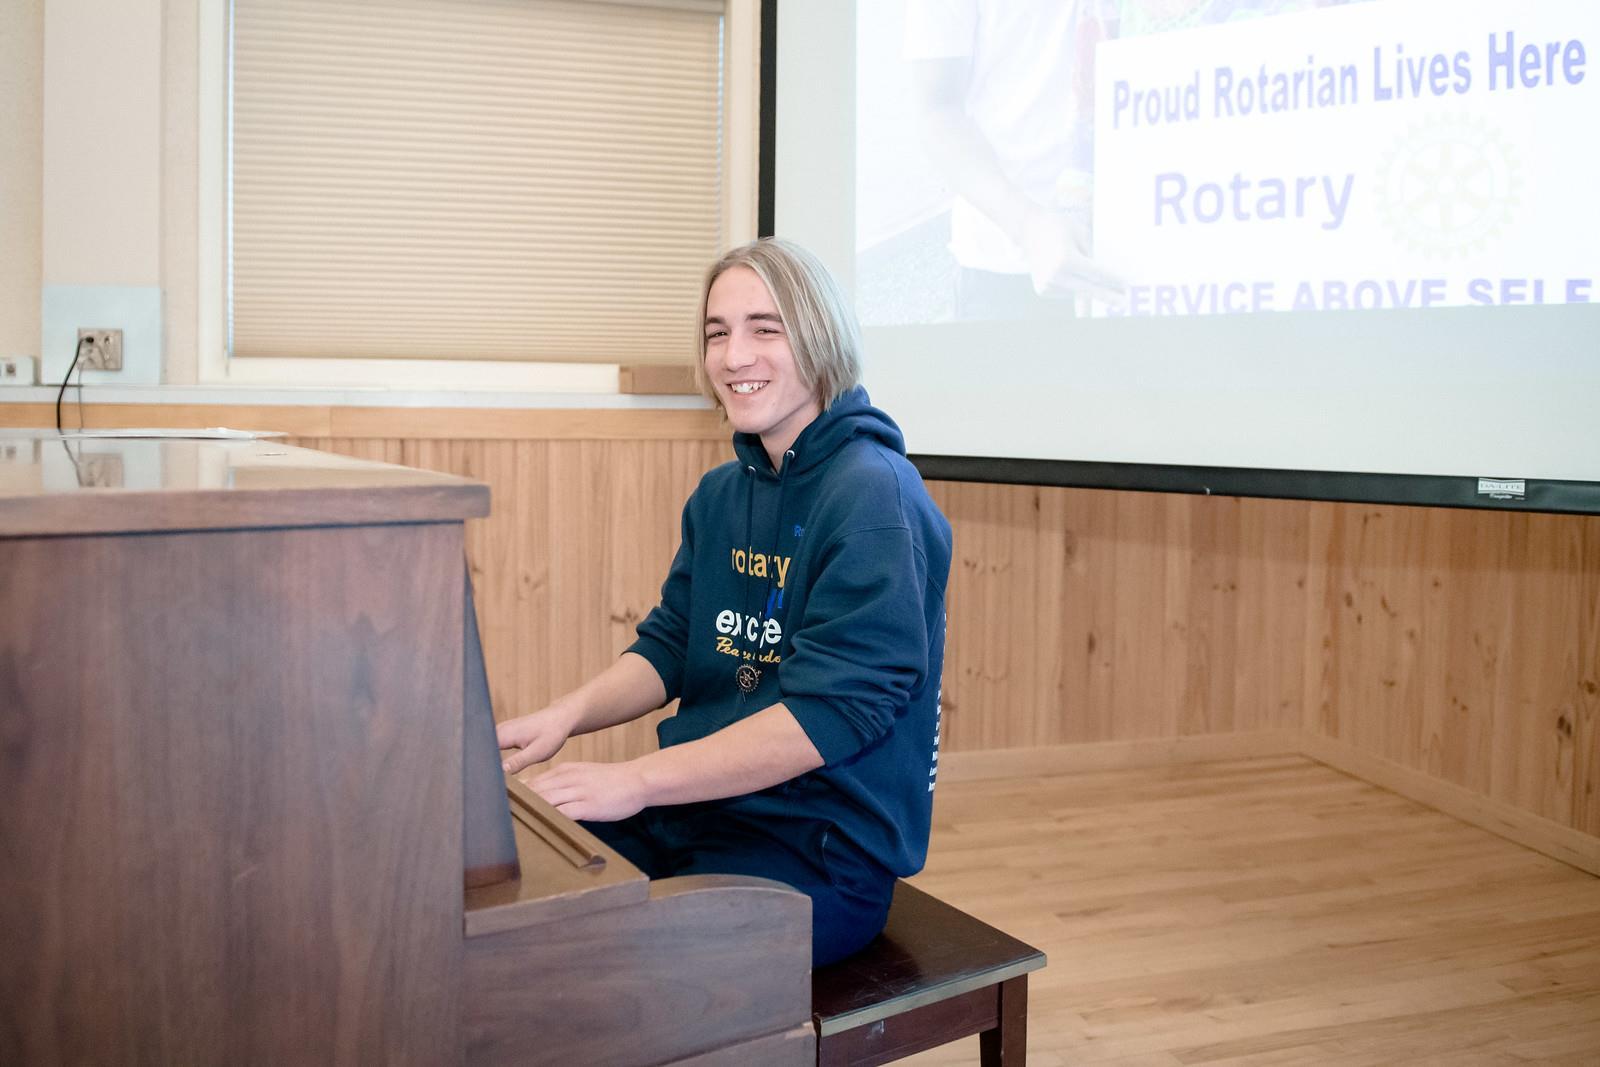 Leo on piano